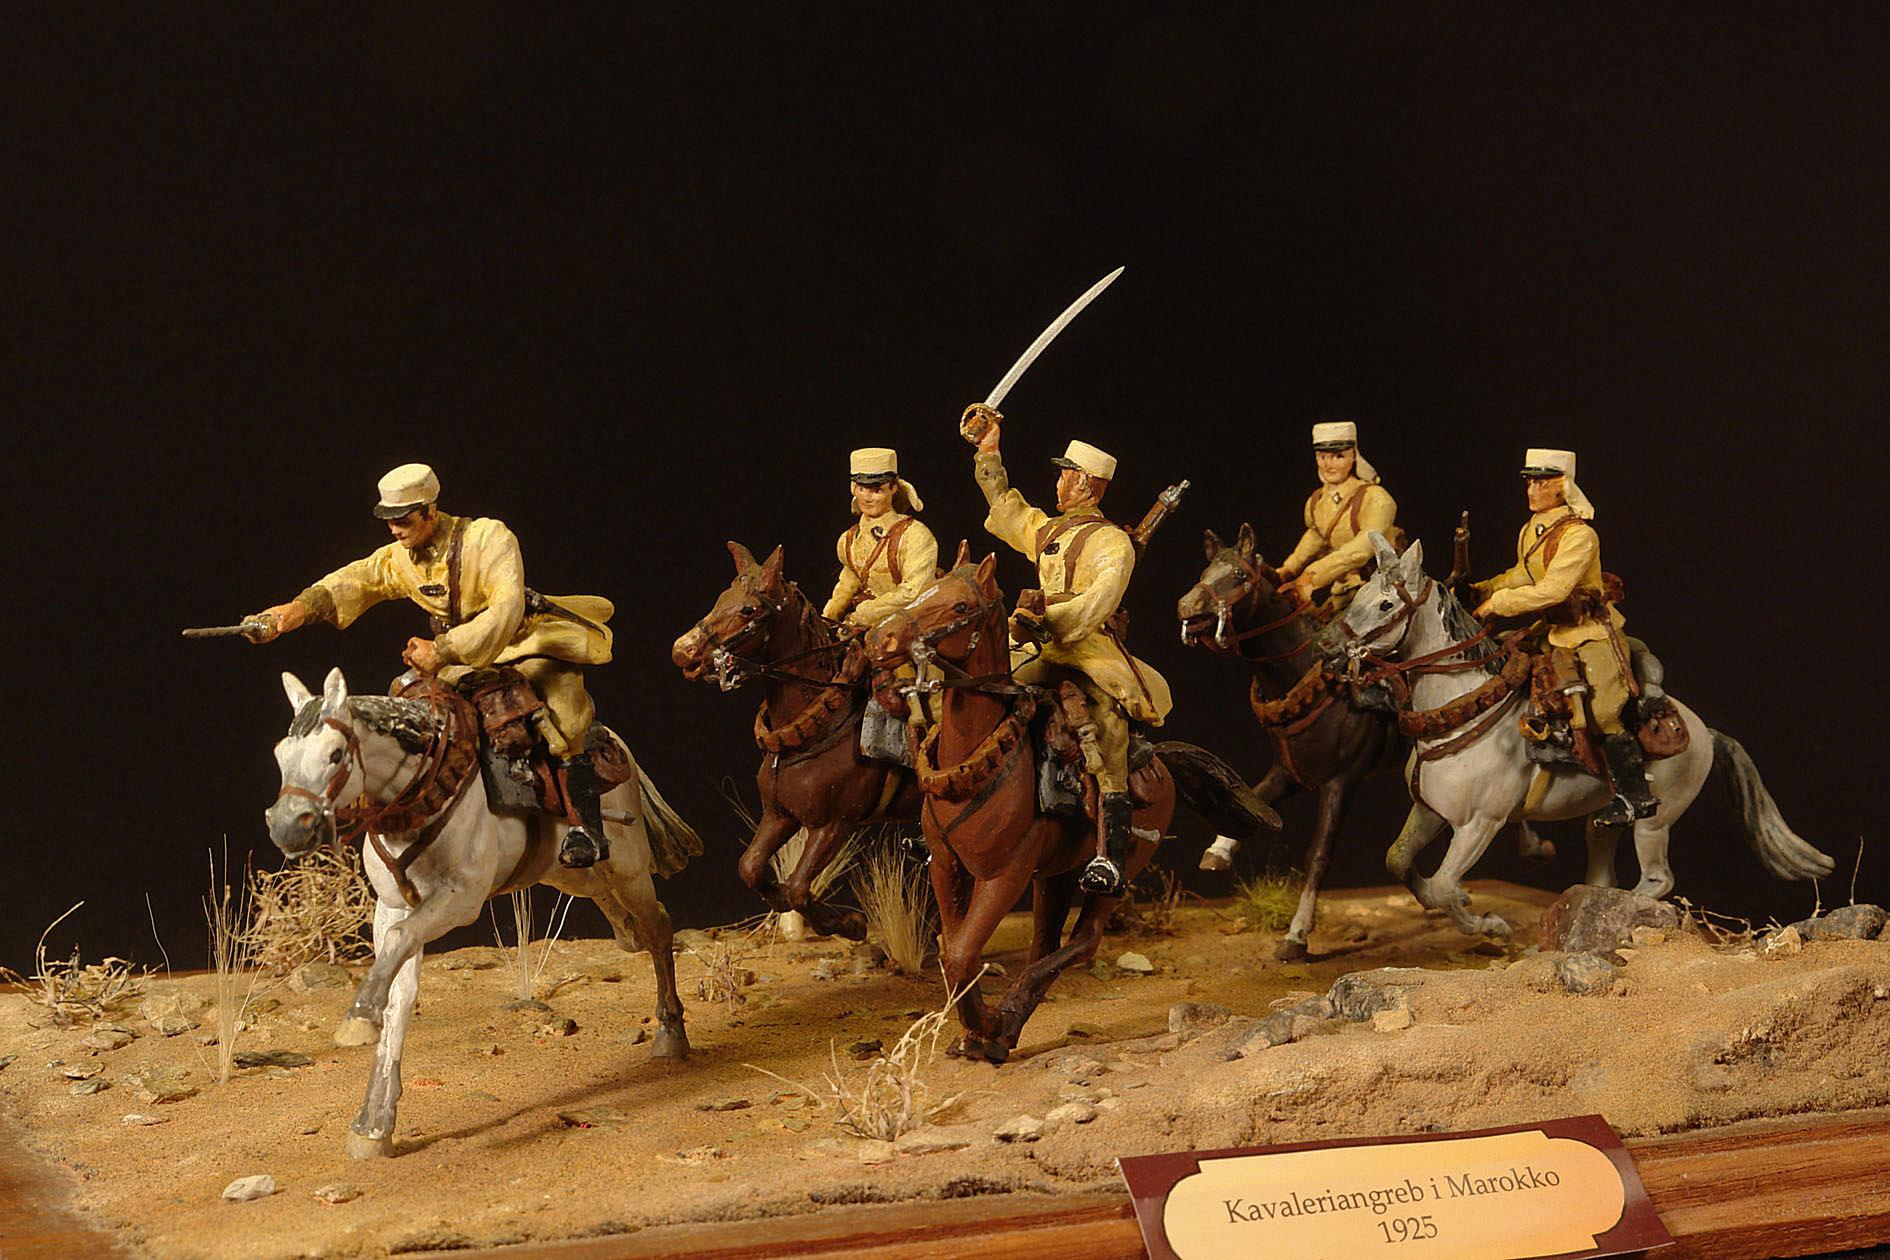 1925-Fransk-kavaleriangreb-i-Marokko-3